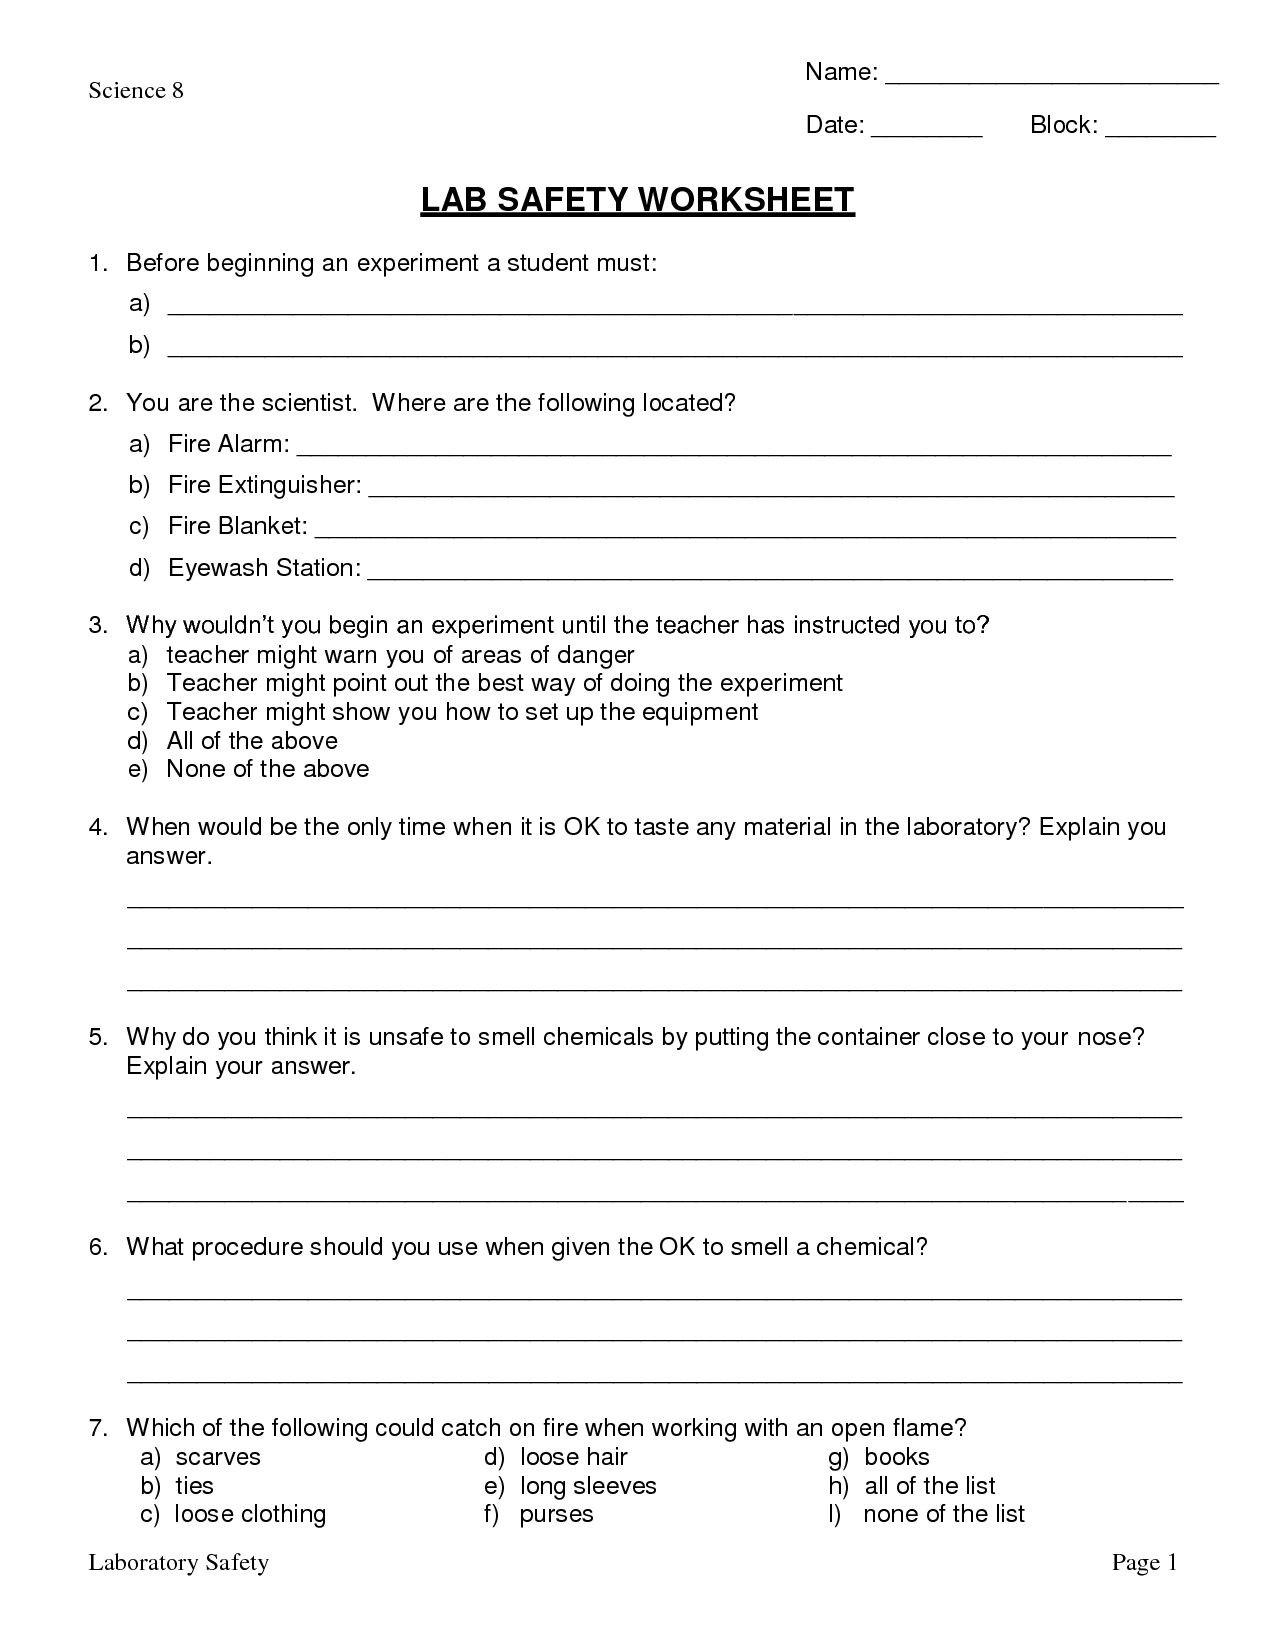 Science Lab Safety Worksheet